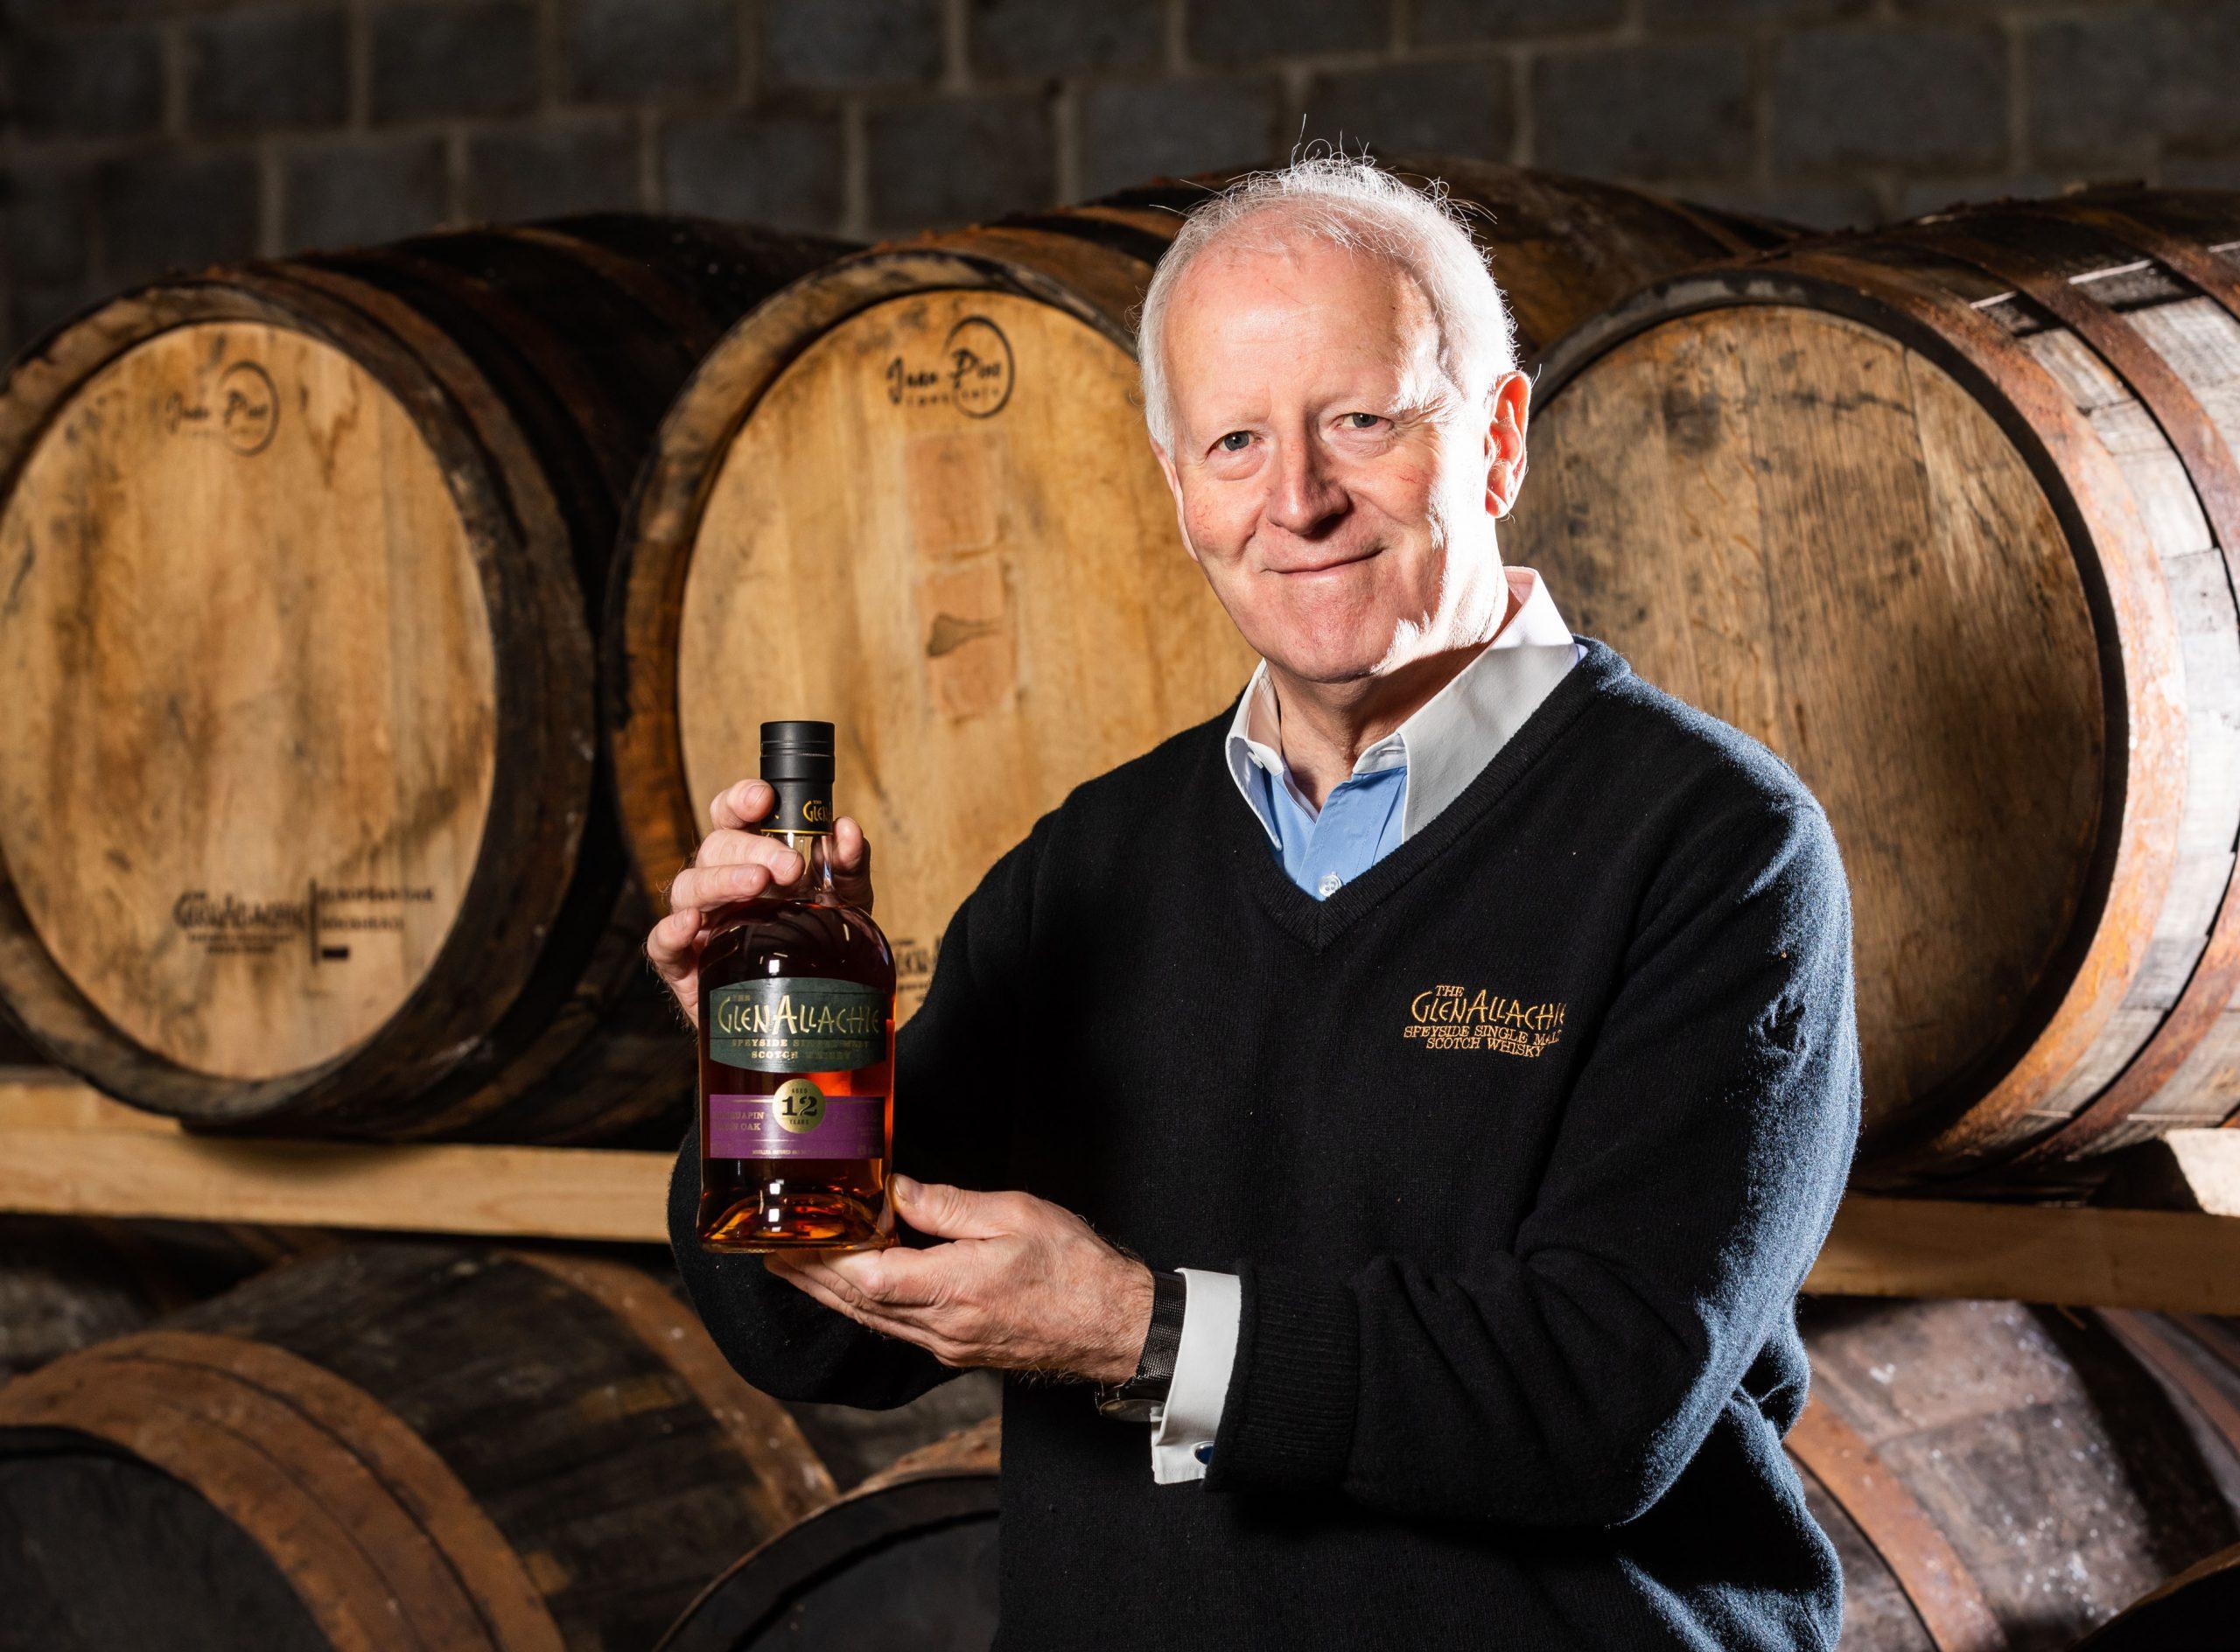 Billy Walker, Master Blender at The GlenAllachie Distillery